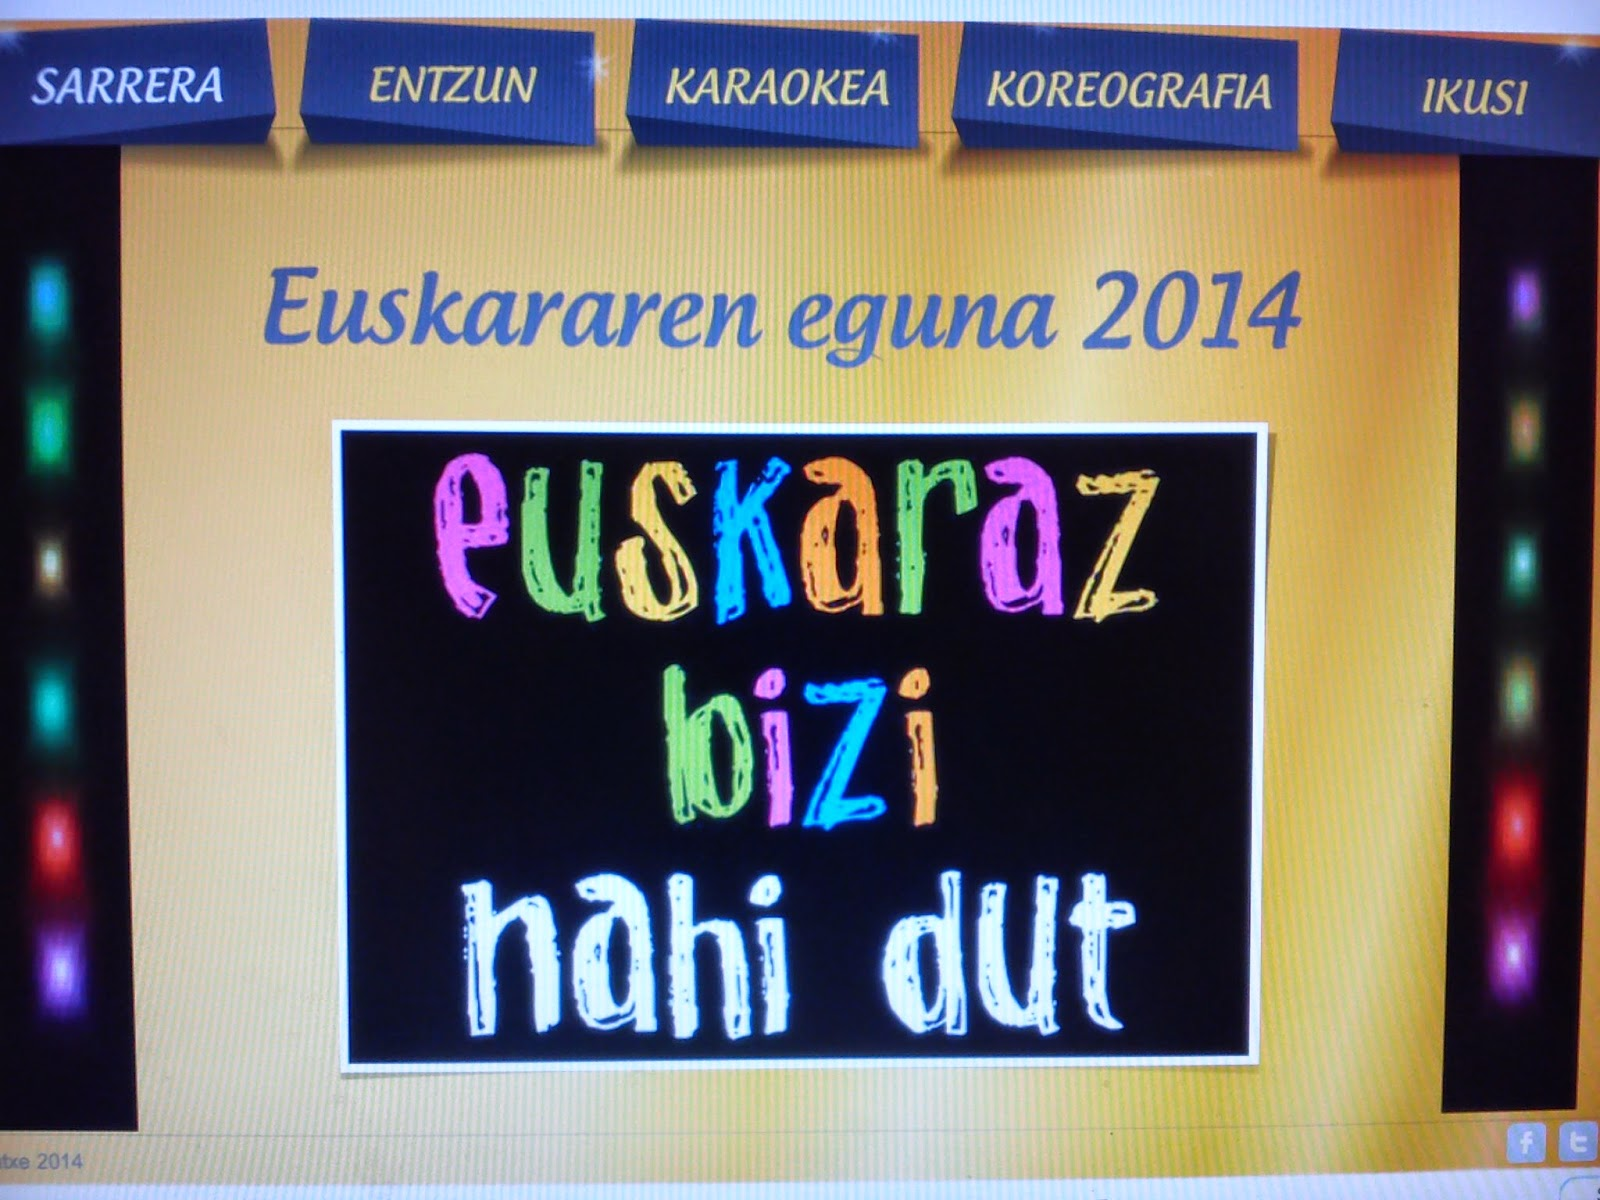 http://iratxeallend1.wix.com/euskarareneguna2014